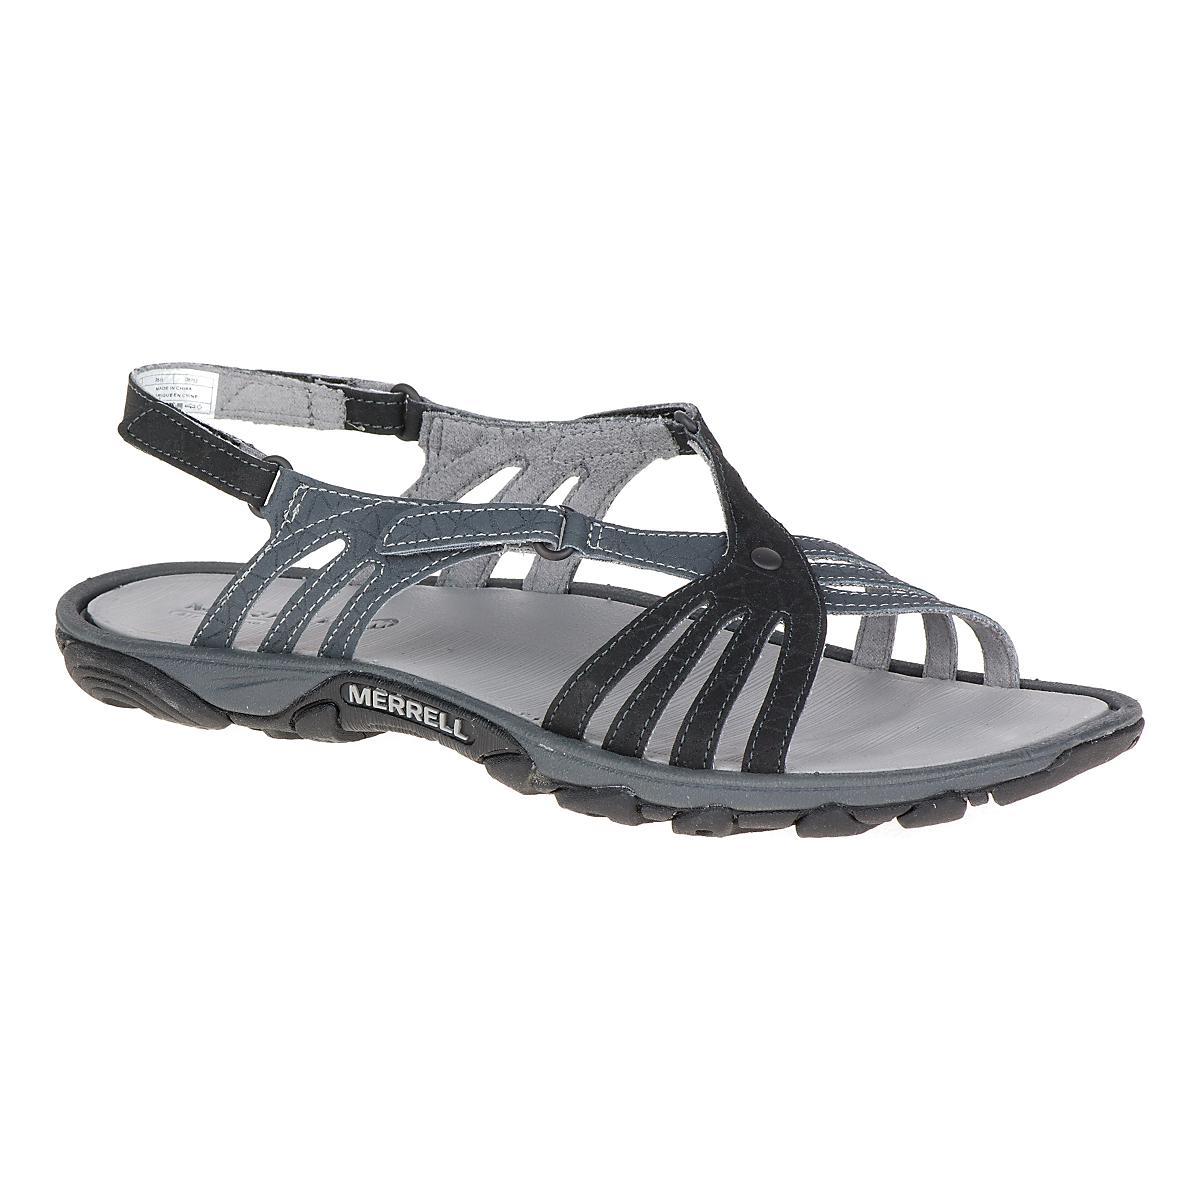 Black merrell sandals - Black Merrell Sandals 31